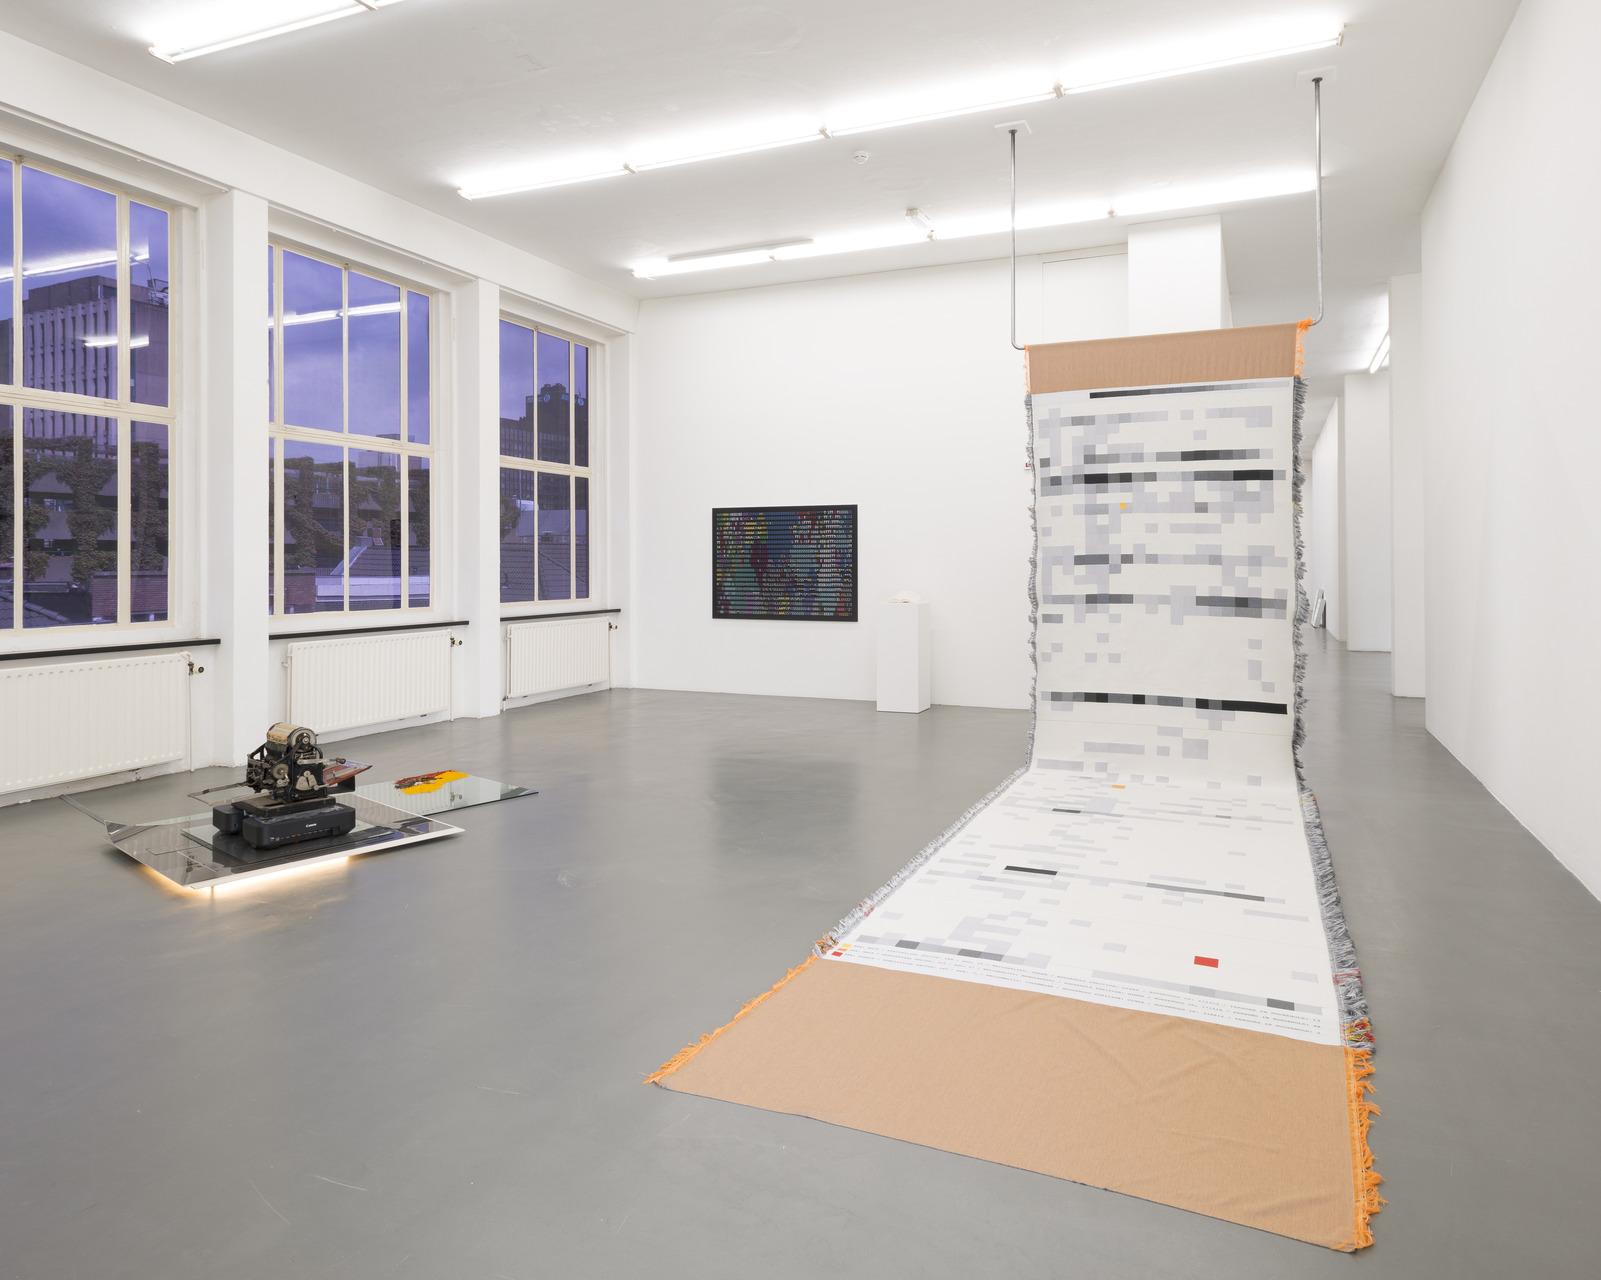 25_Installation view, Rossella Biscotti, David Jablonowski, John Menick